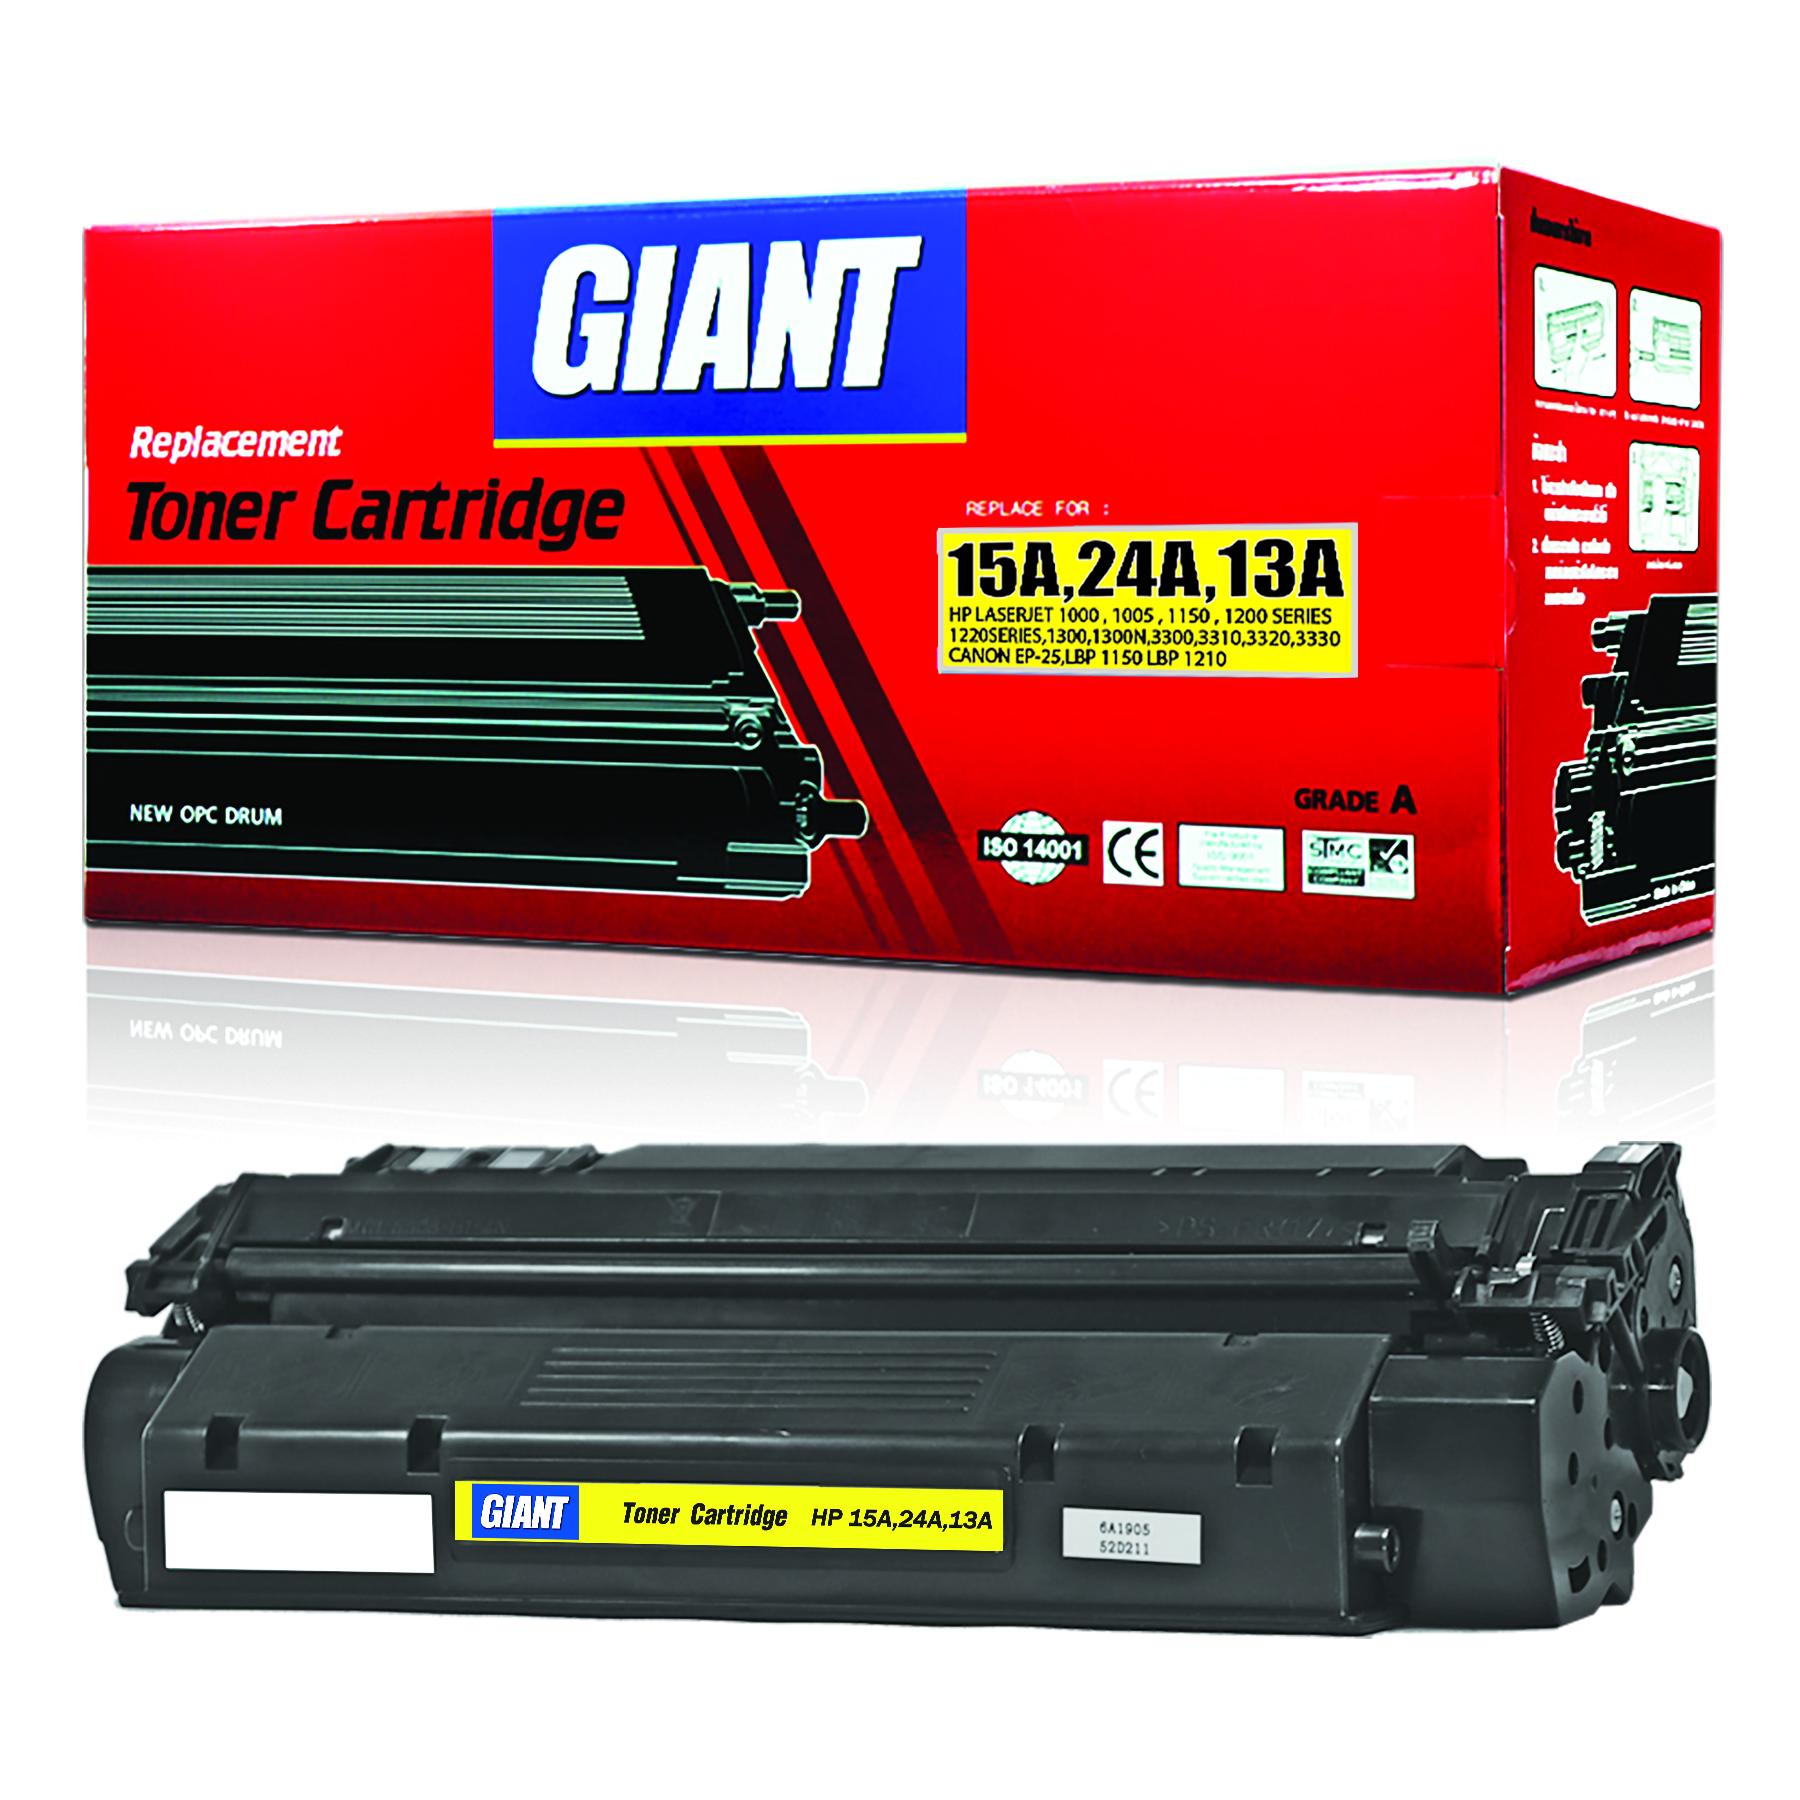 Giant Canon LBP1210 ตลับหมึกเลเซอร์ดำ Cartridge EP-25 (Black)